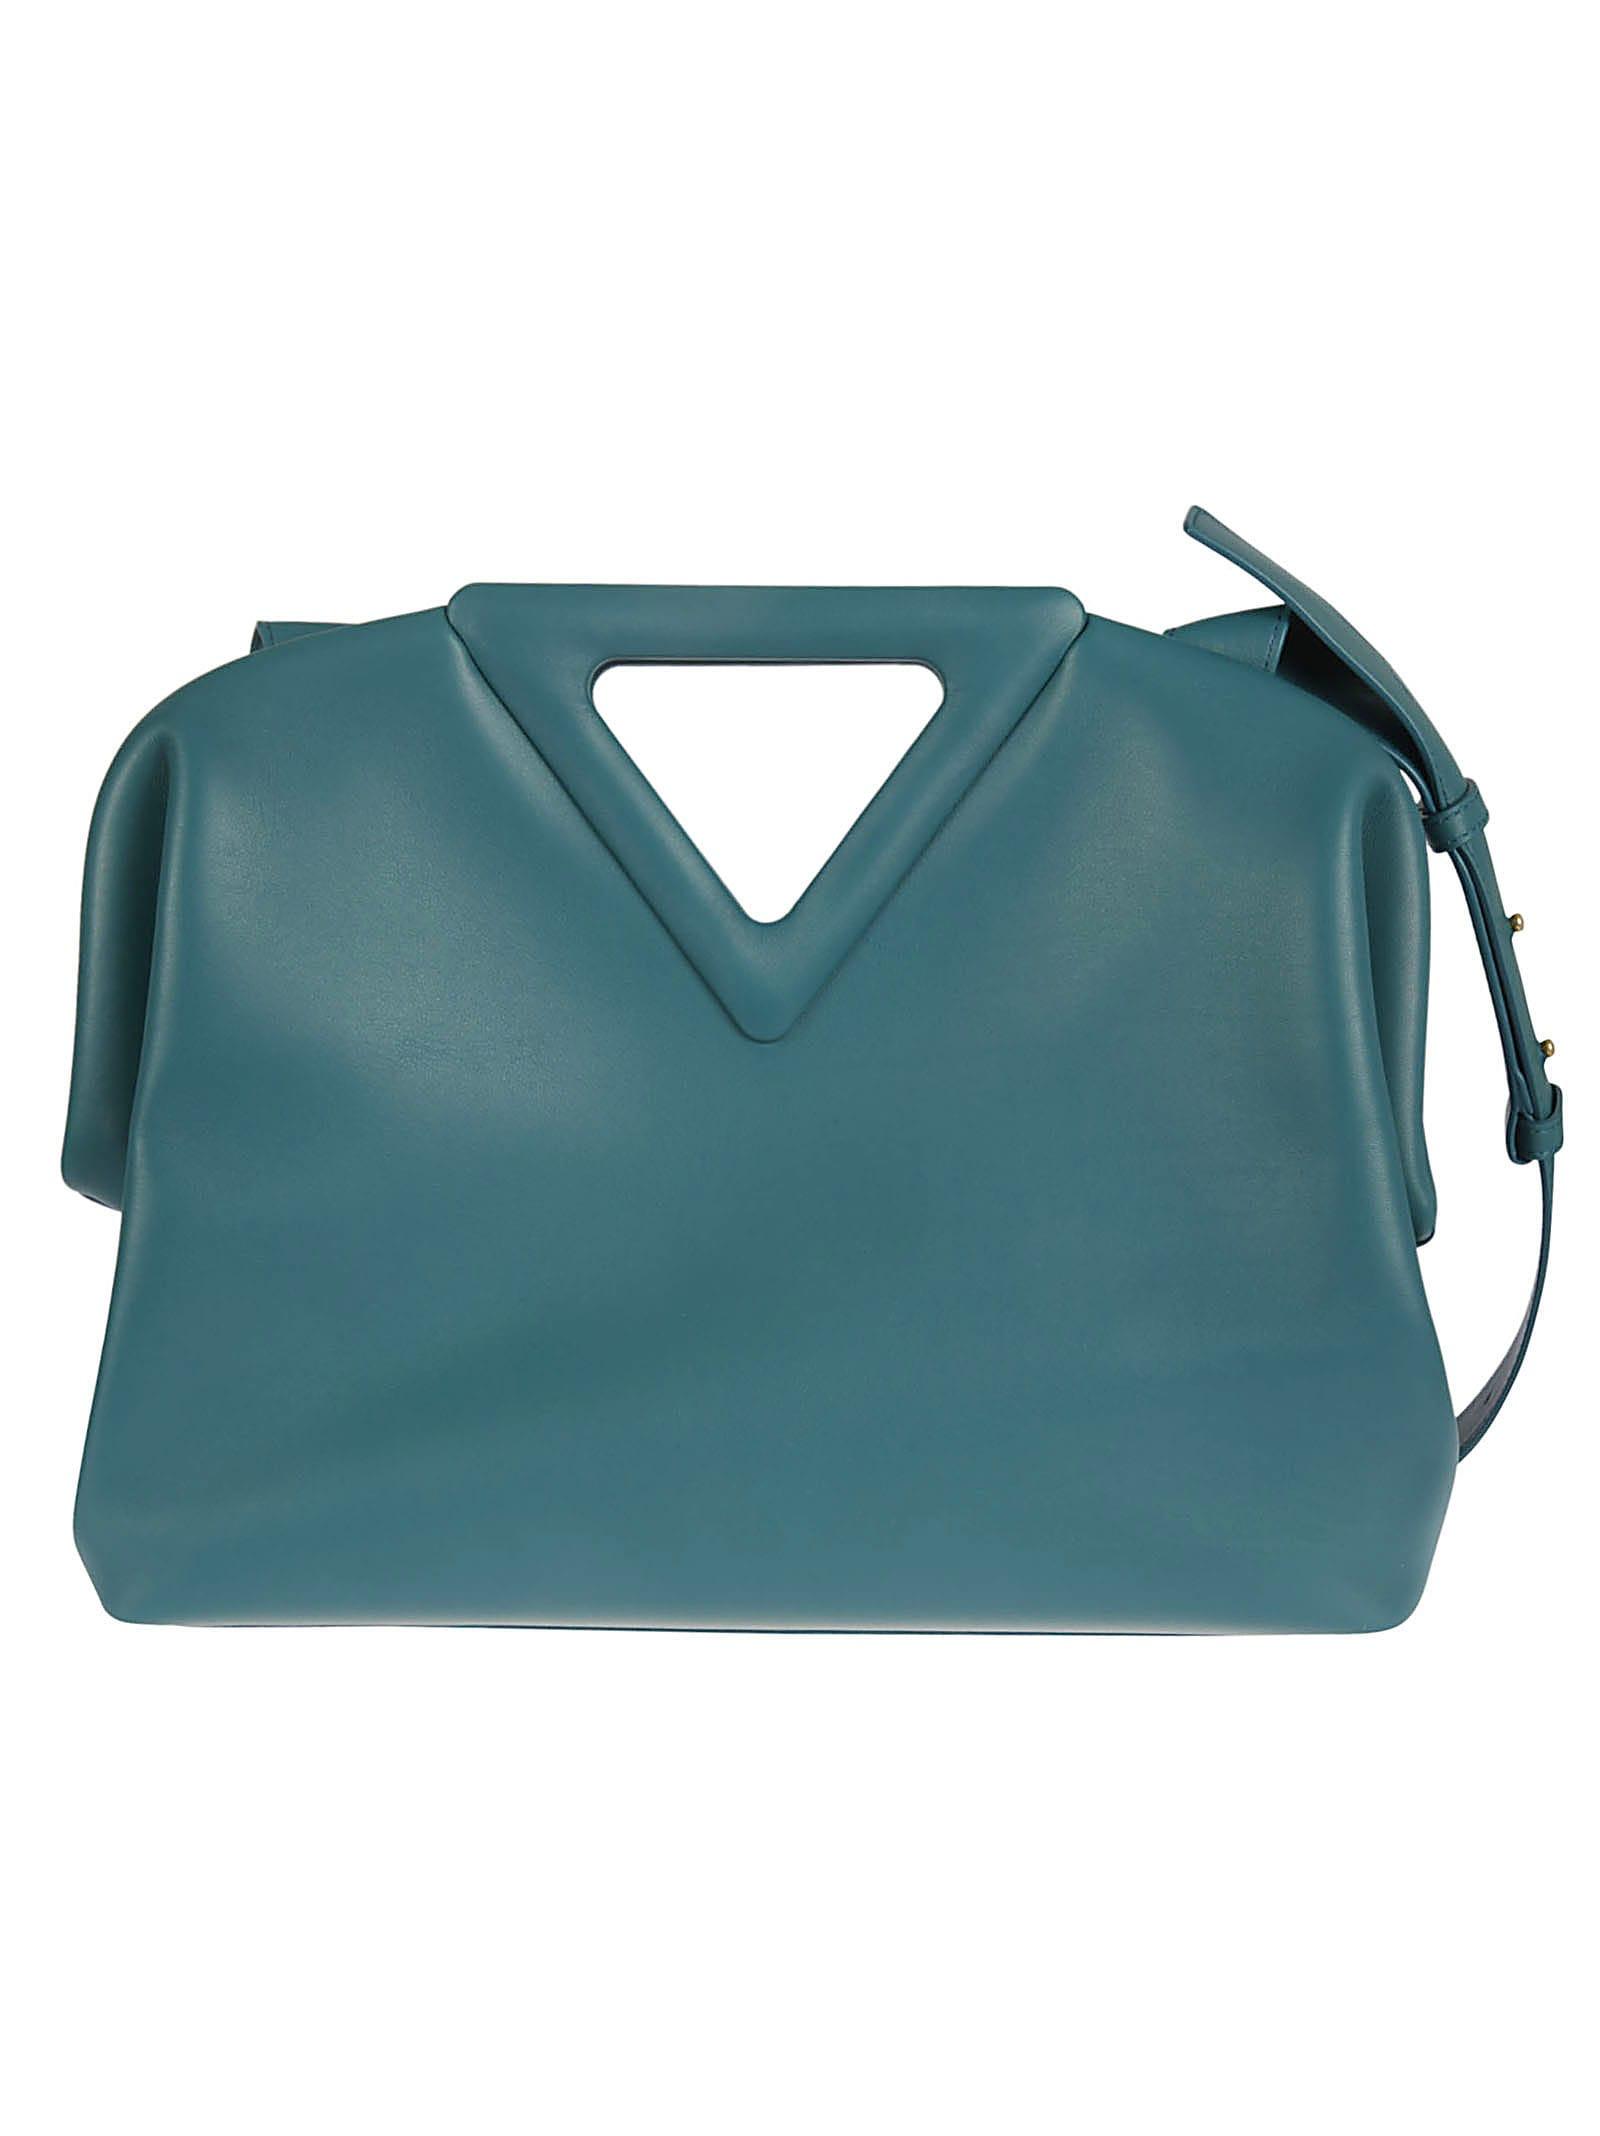 Bottega Veneta The Triangle Vit Shoulder Bag